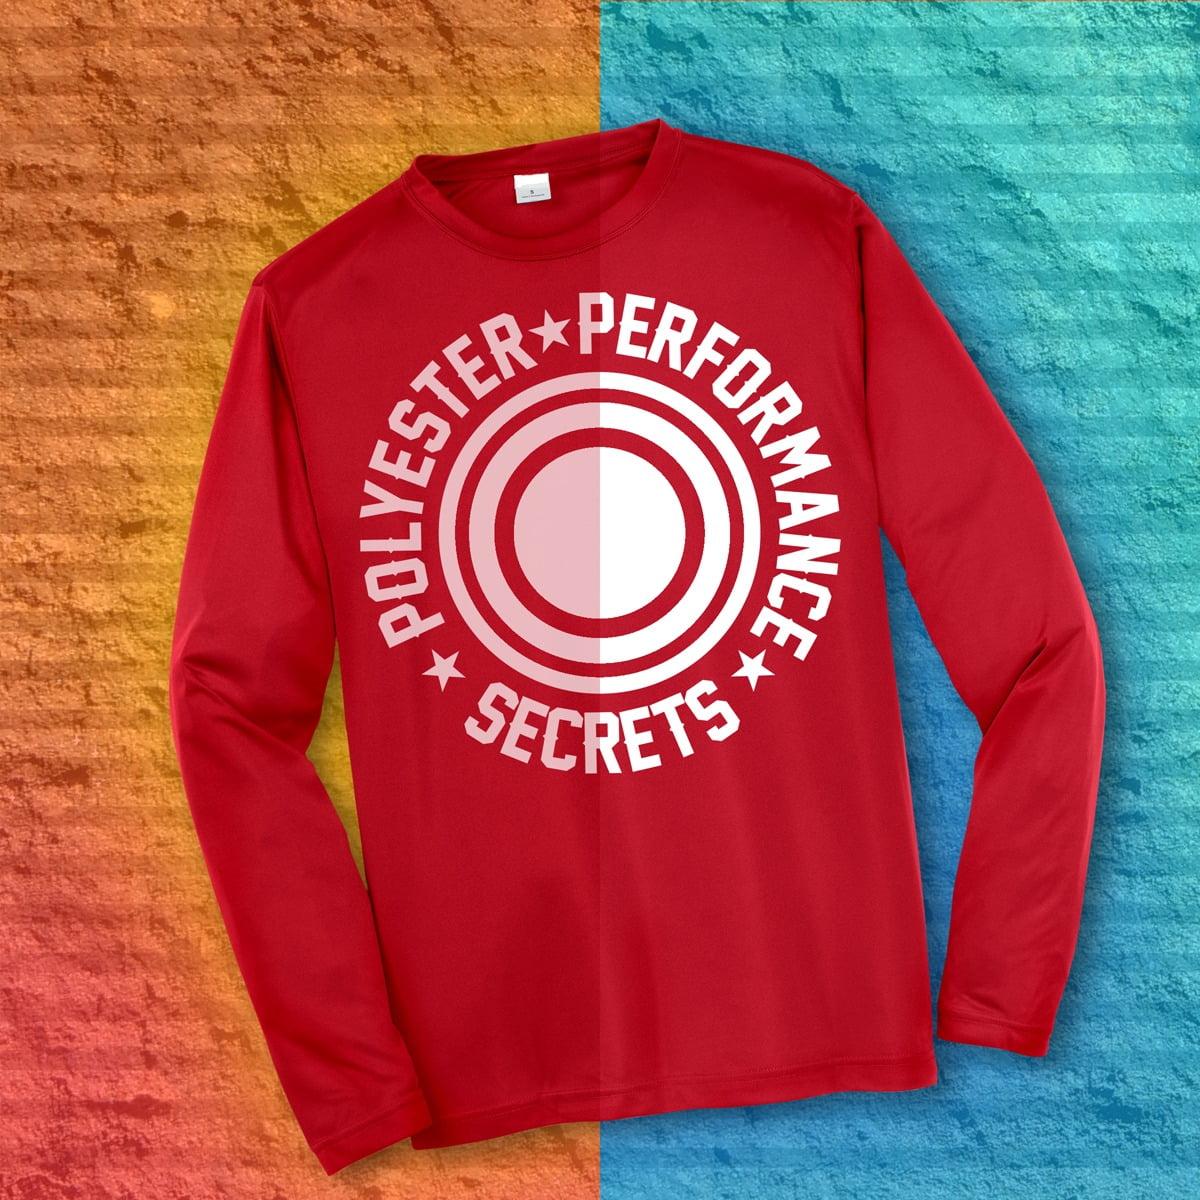 polyester-performance-secrets